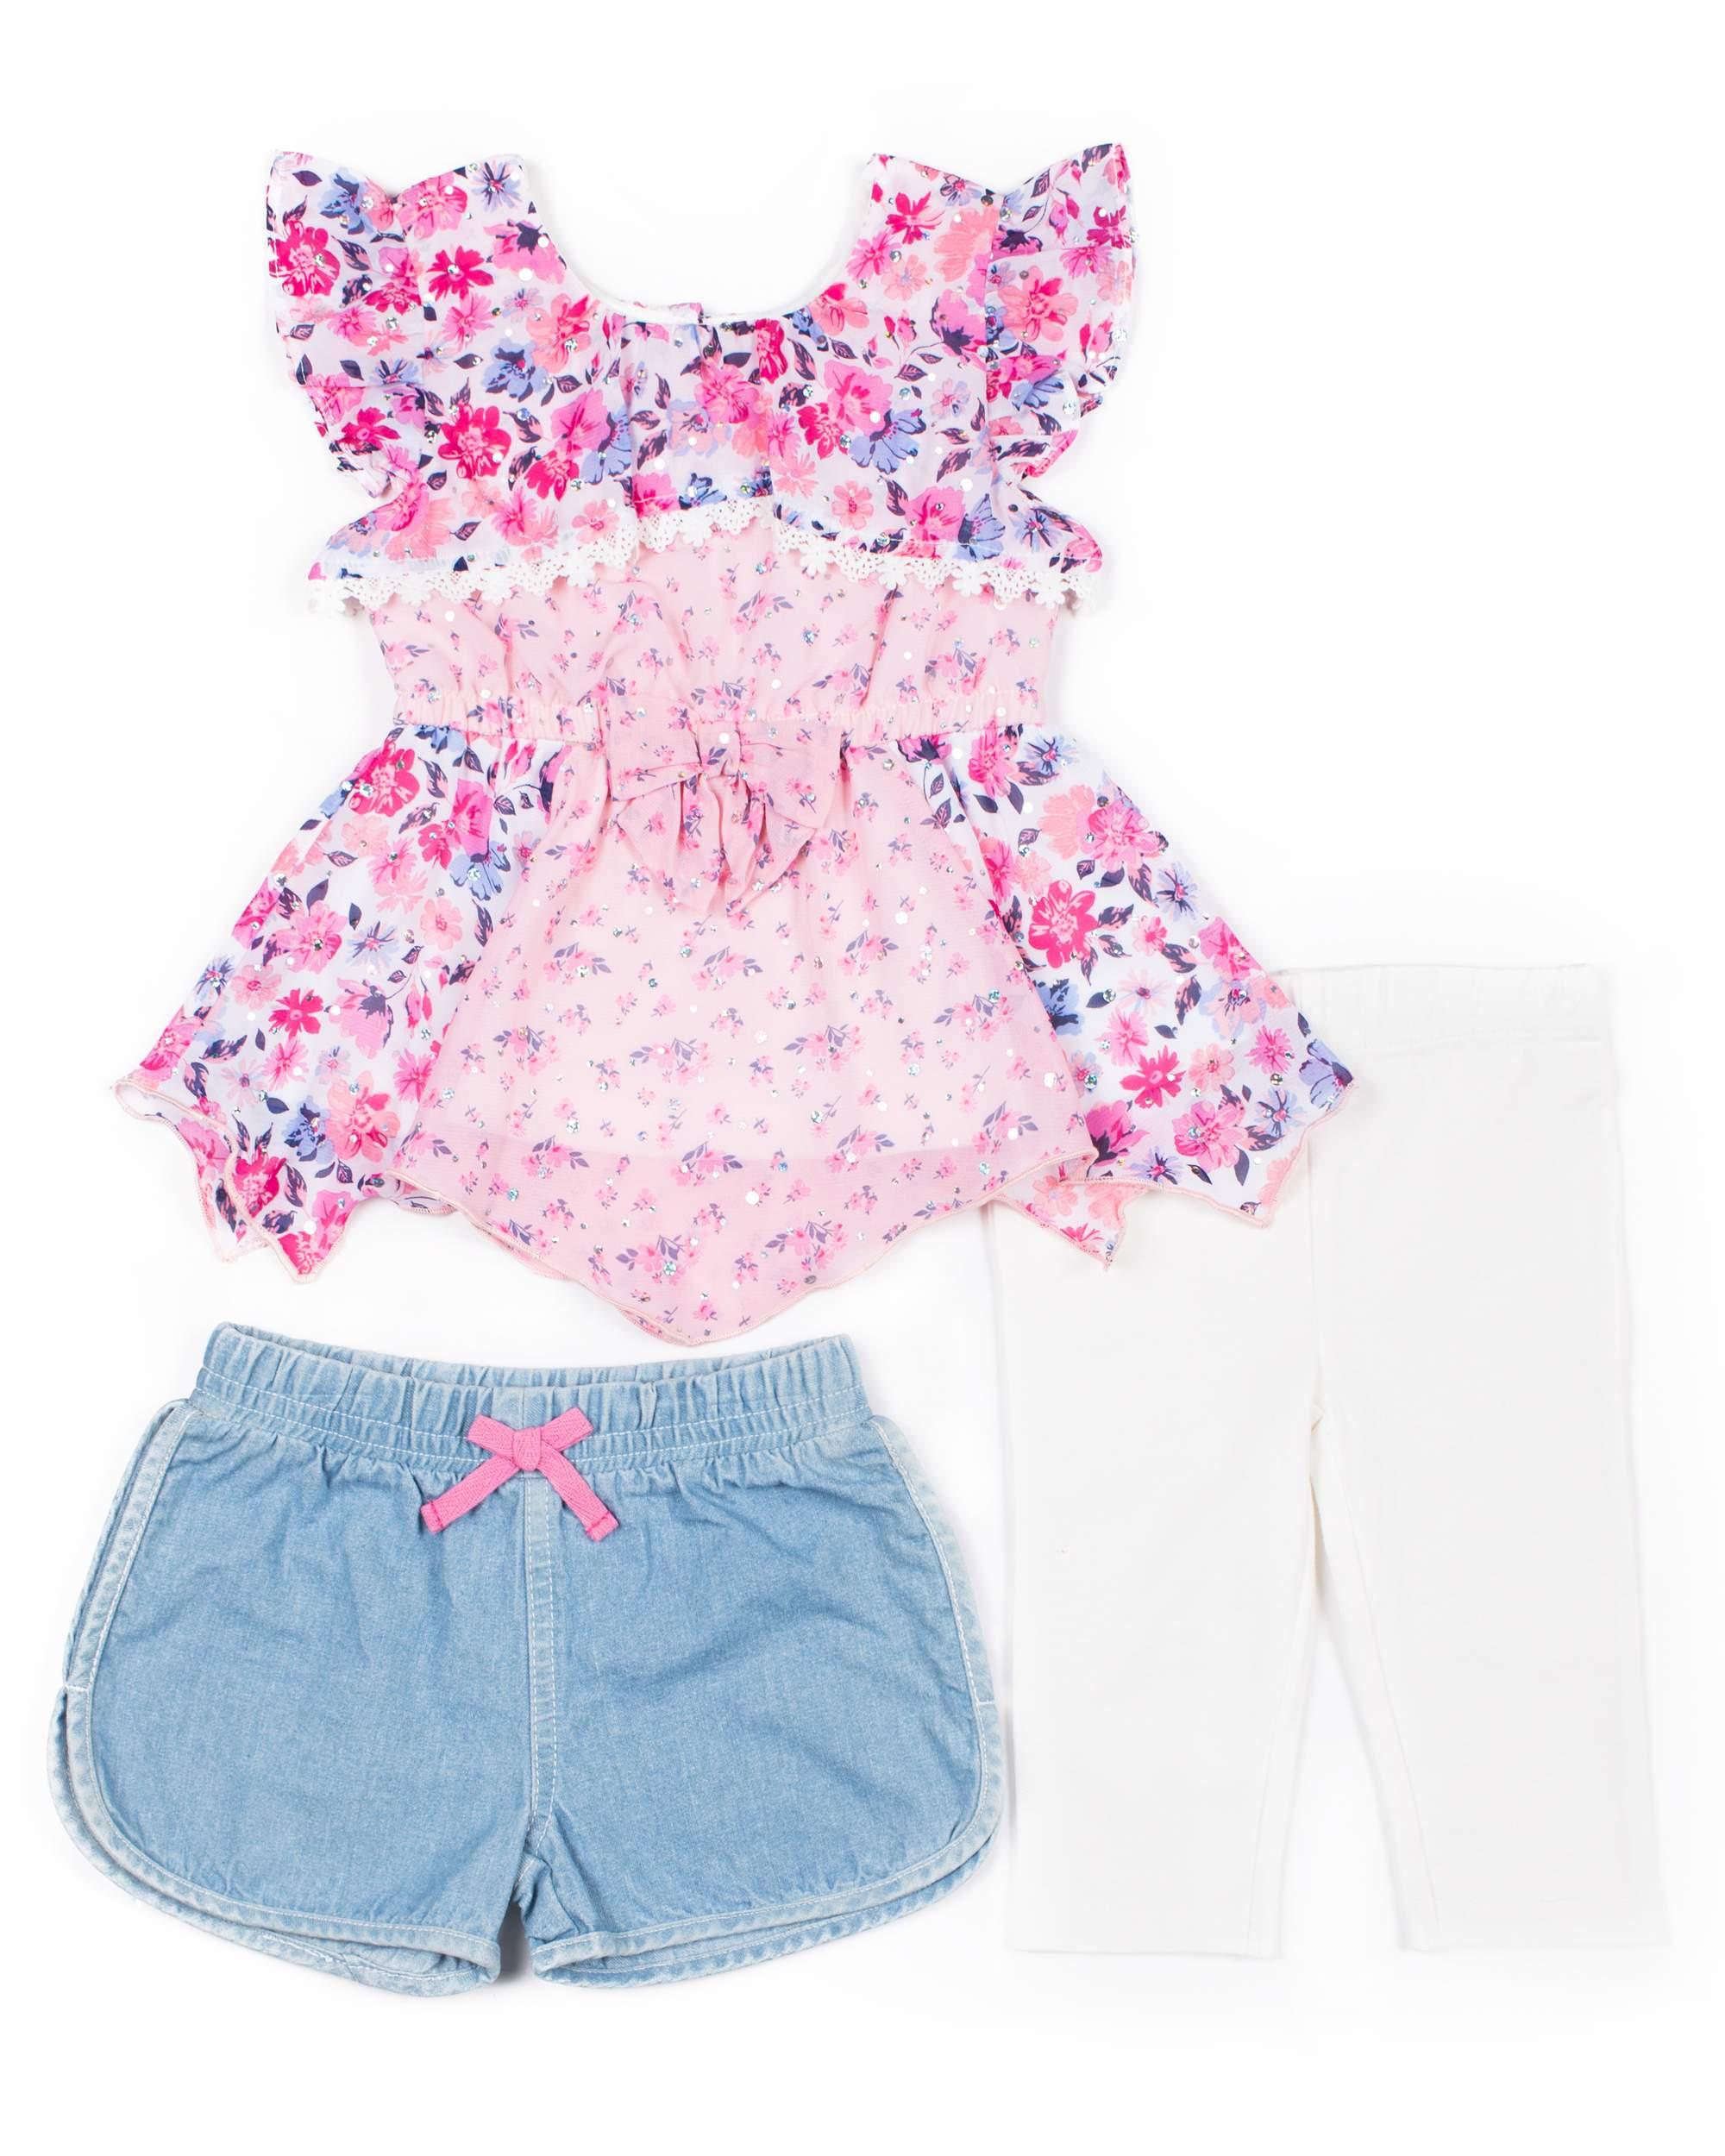 Sleveless Printed lace Chiffon, Denim Short & Capri, 3pc Outfit Set (Baby Girls & Toddler Girls)